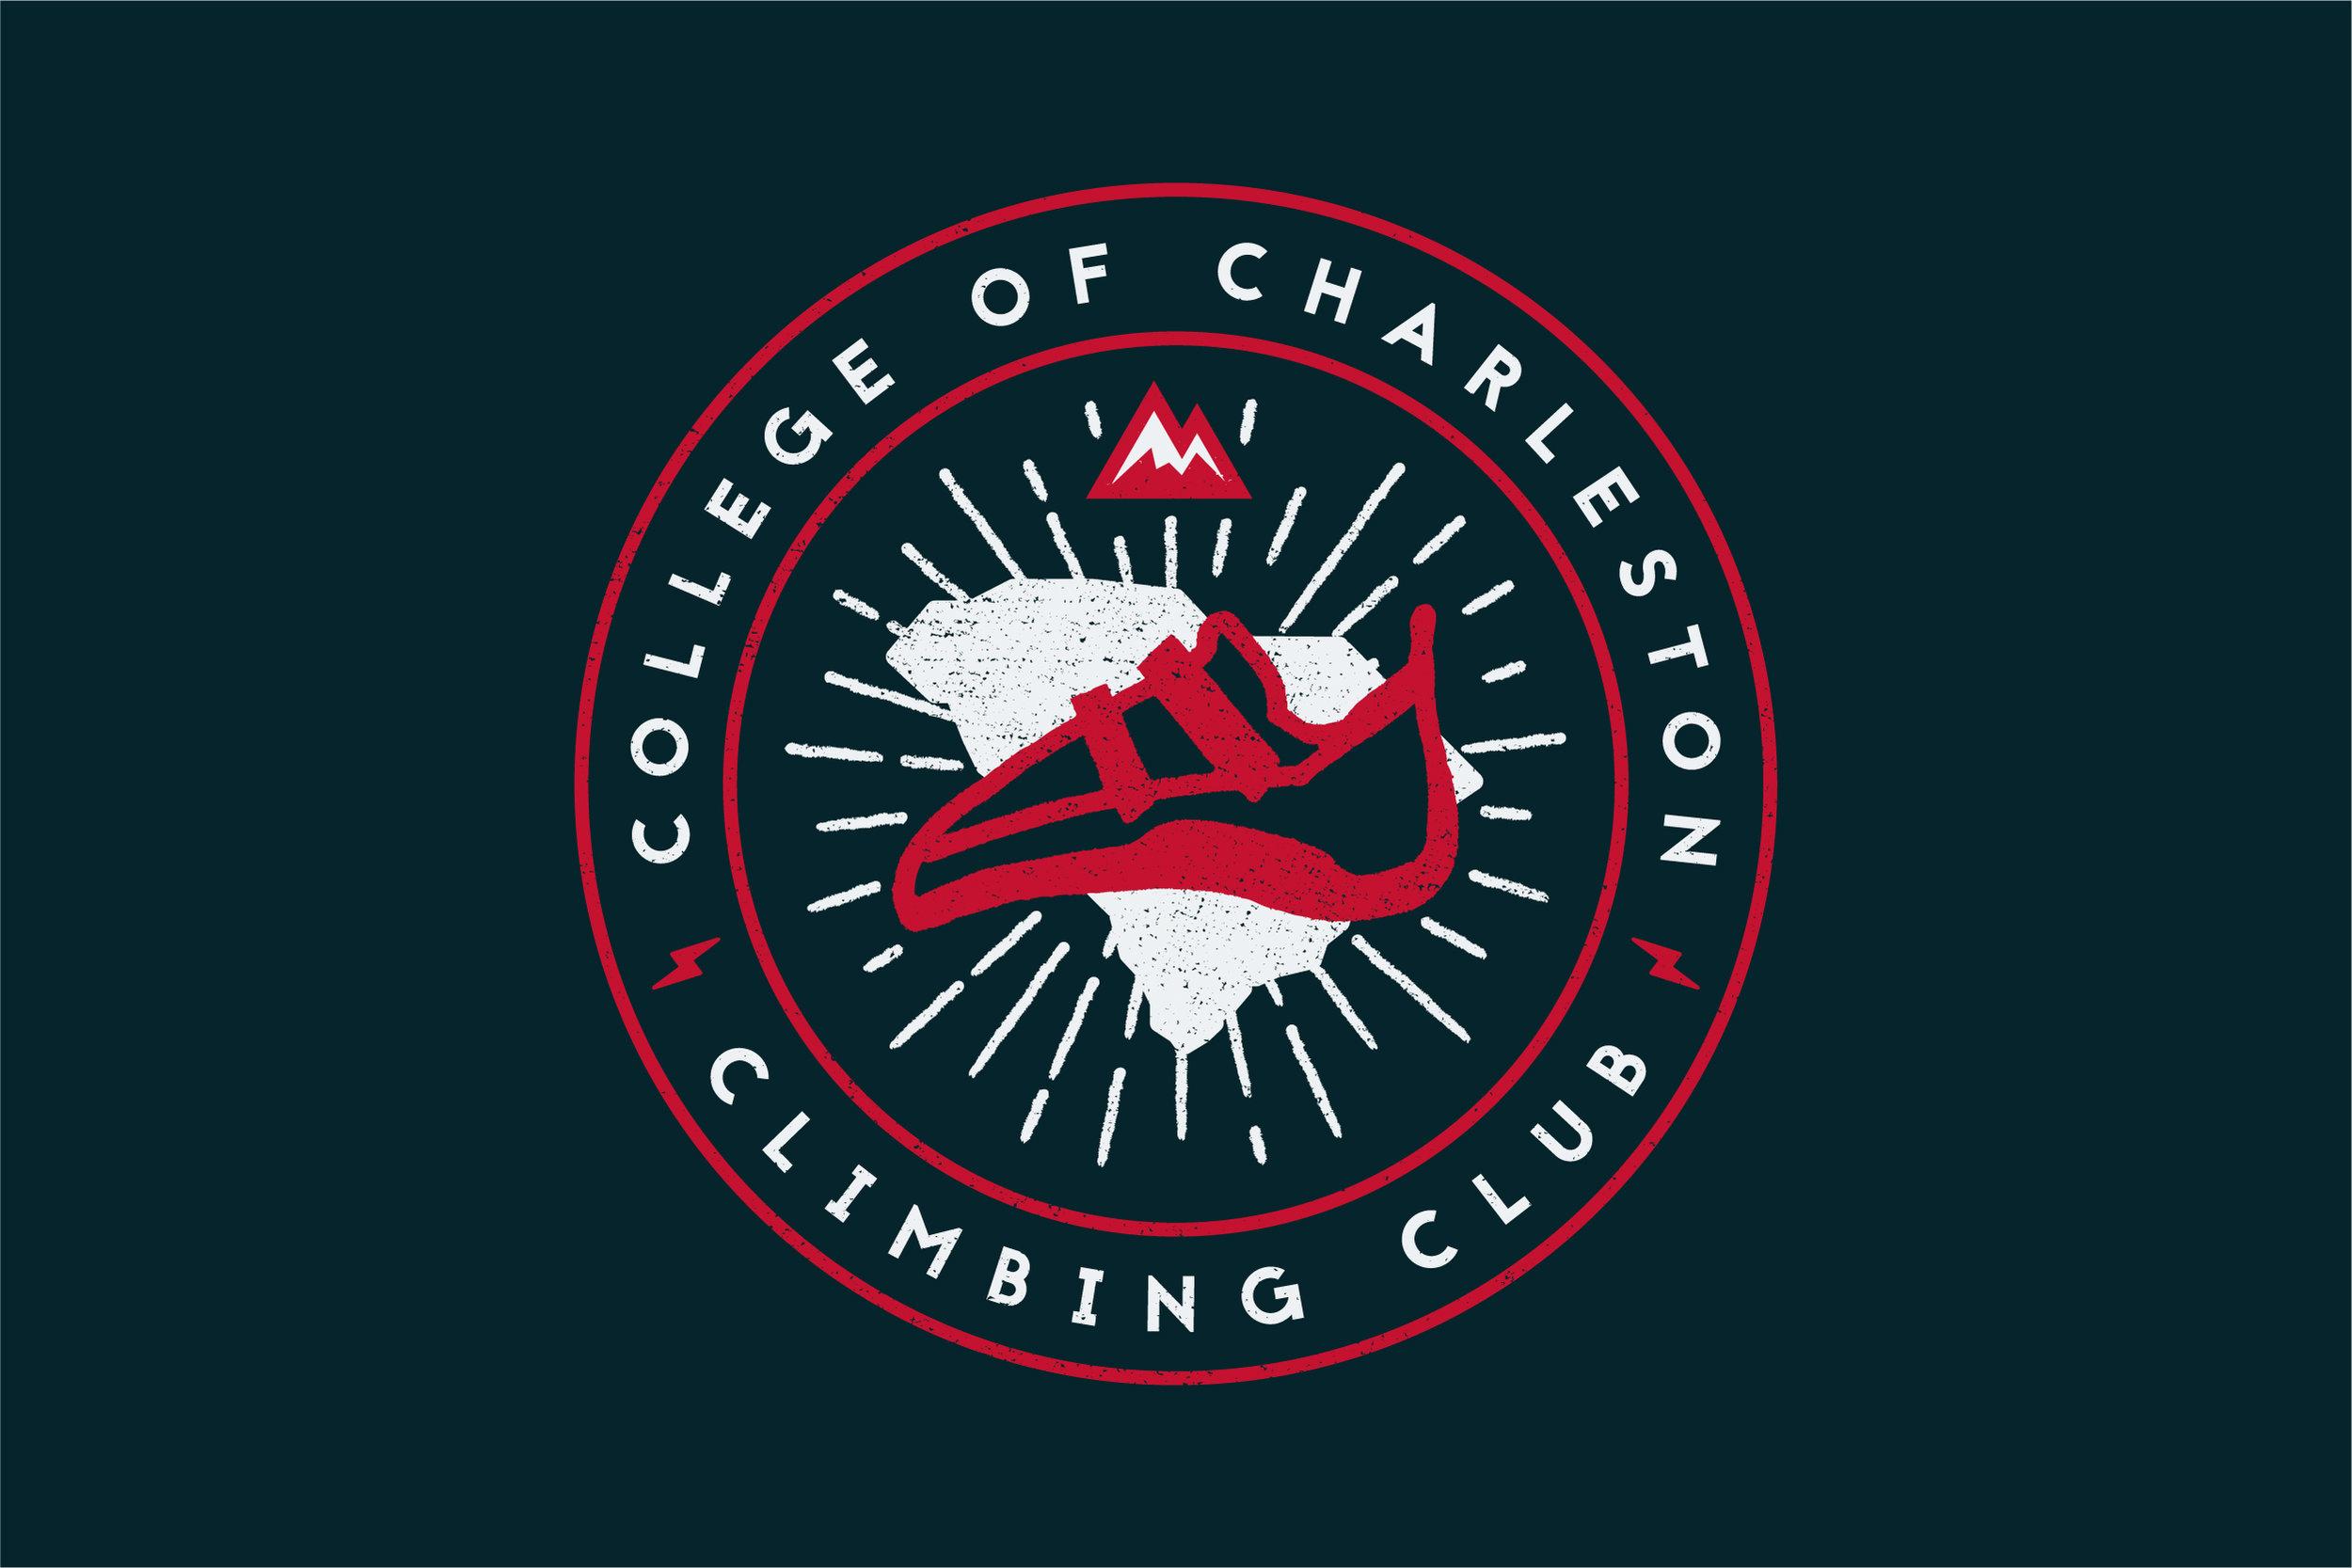 CofC Climbing Club-02.jpg